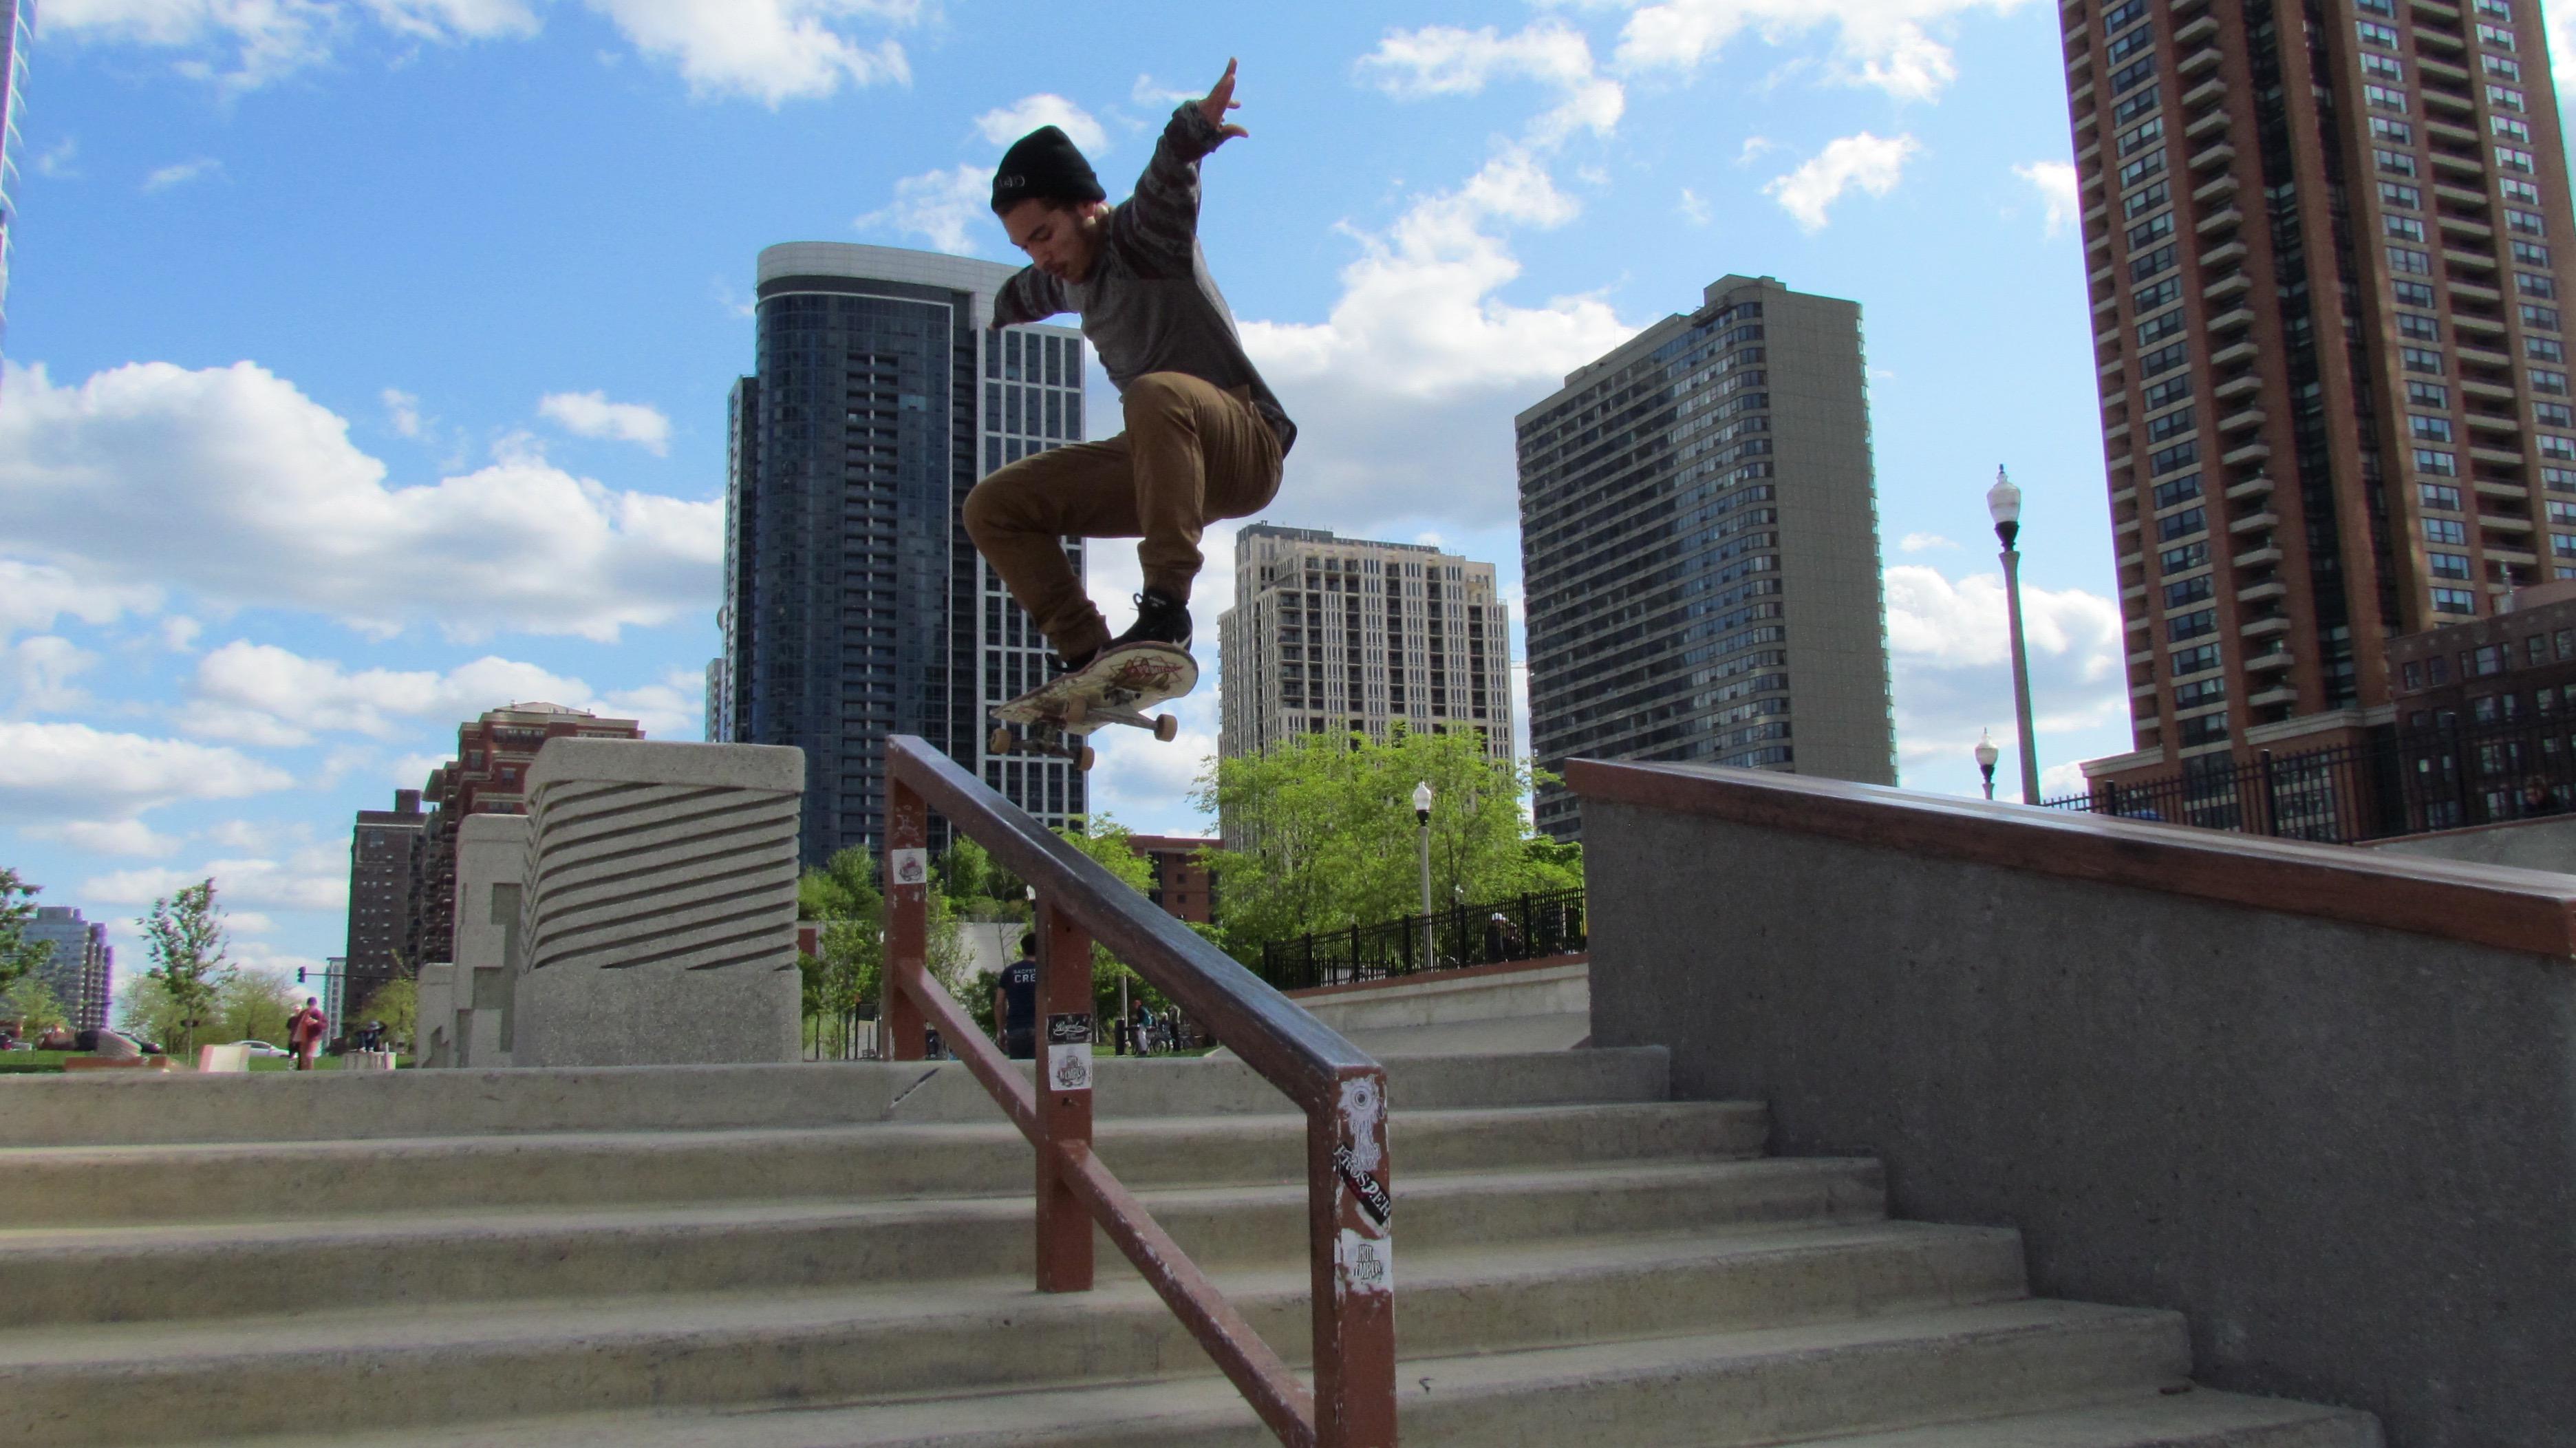 Grant Park Skate Park - 1